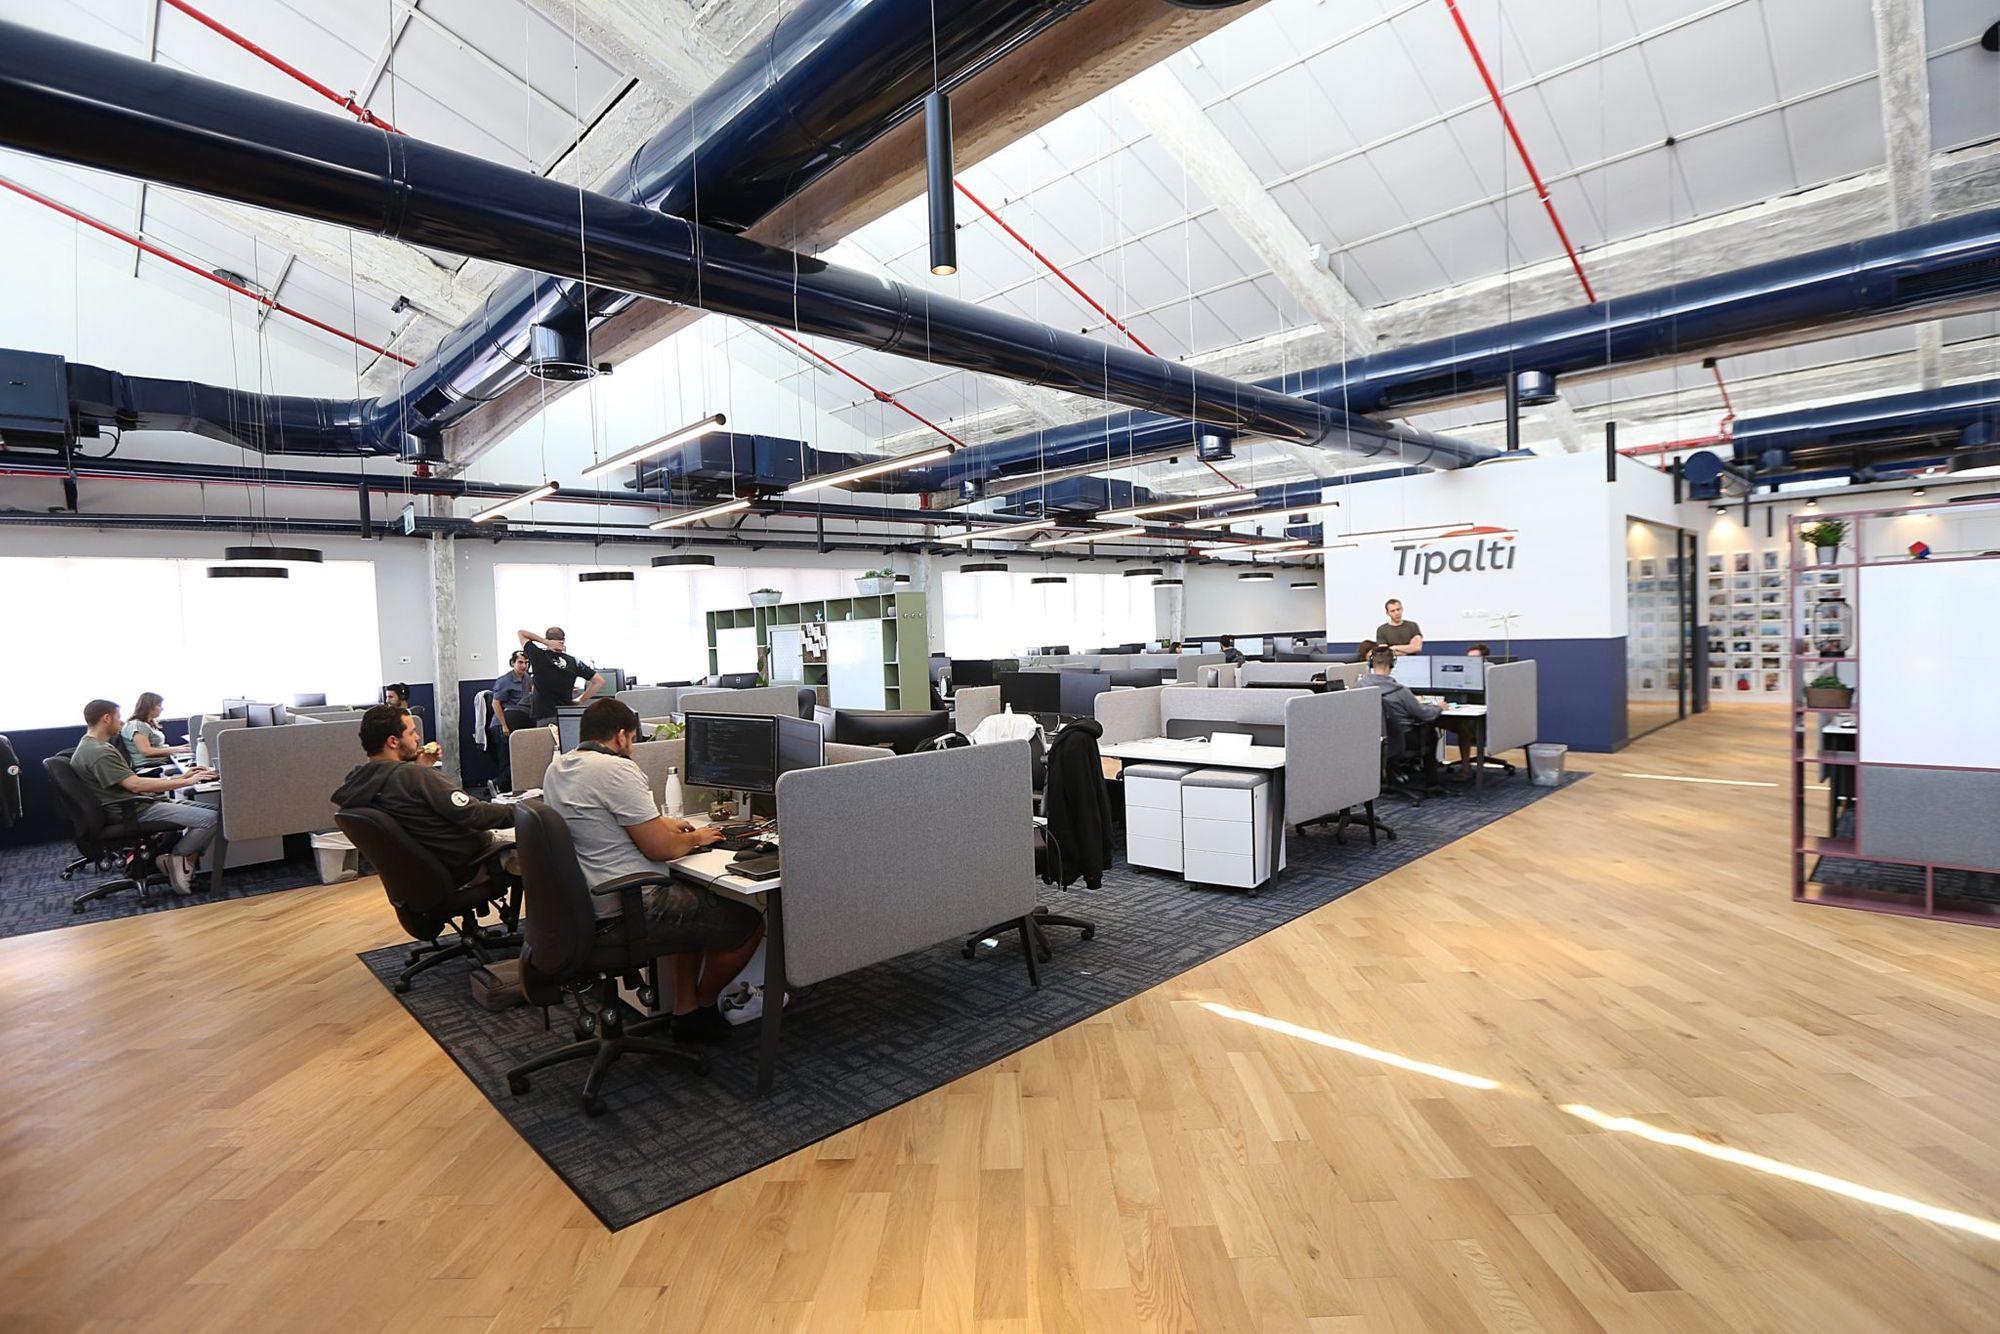 Tipalti acquires Israeli startup Approve.com for $40M